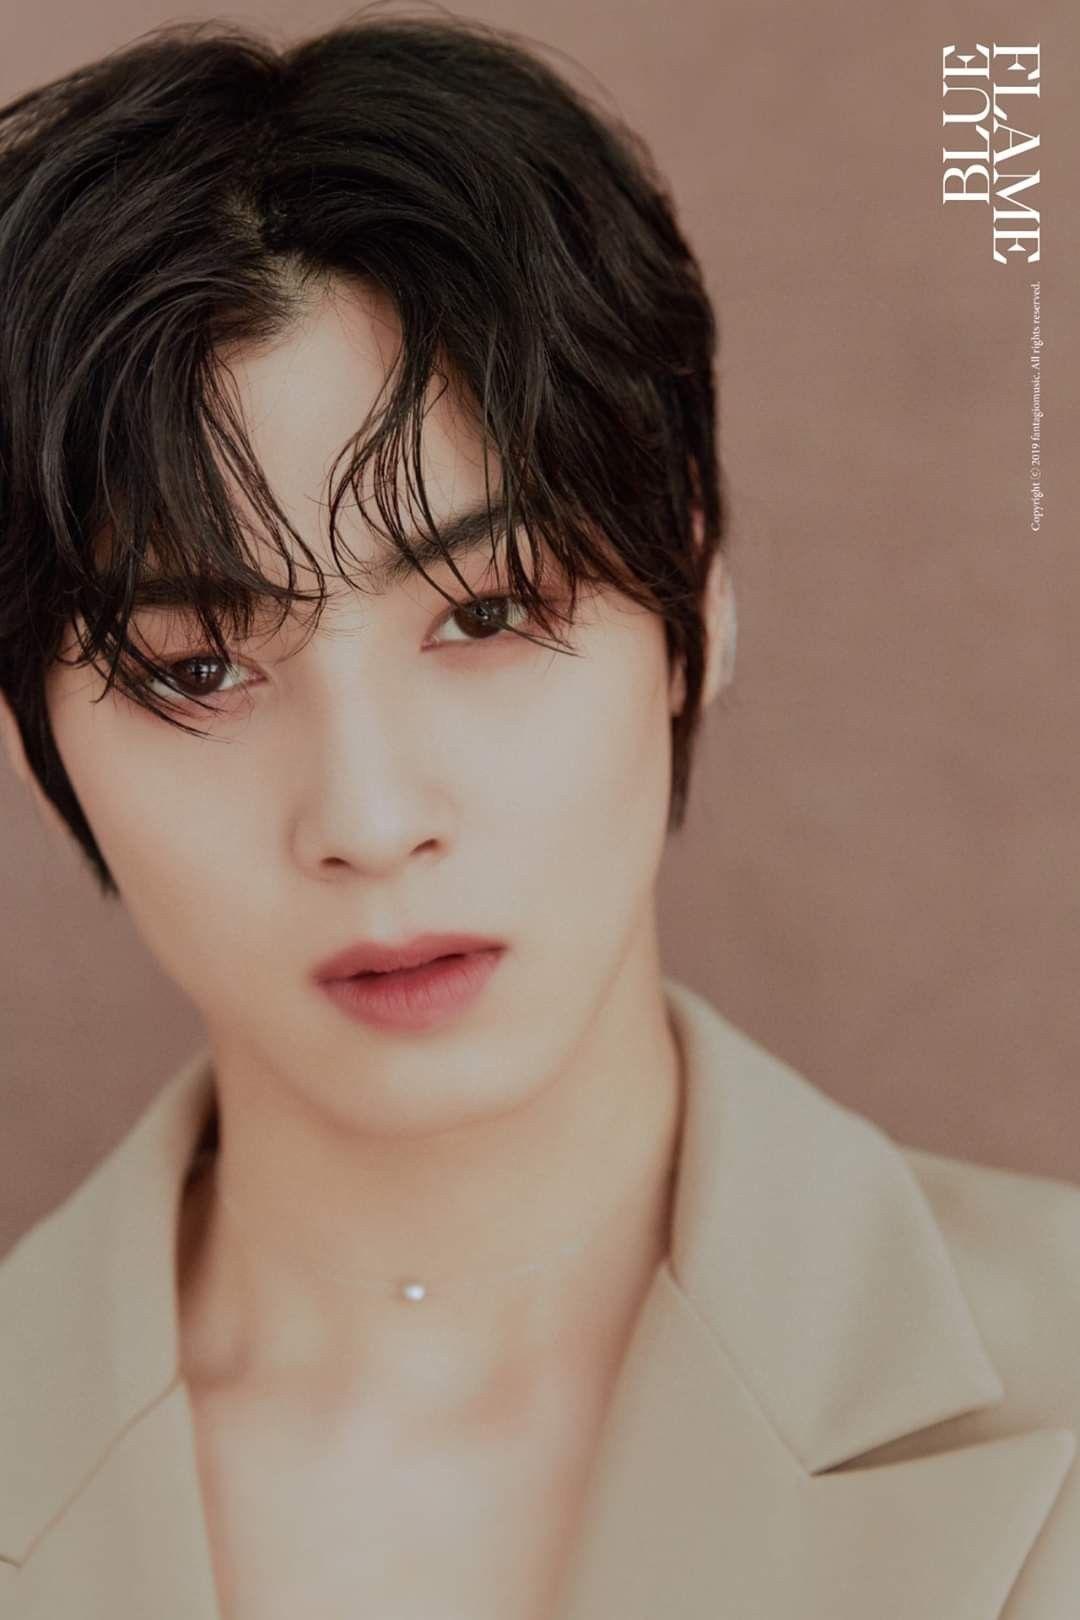 Eunwoo Blueflame Kpop Astro Astro Kpop Astro Cha Eun Woo